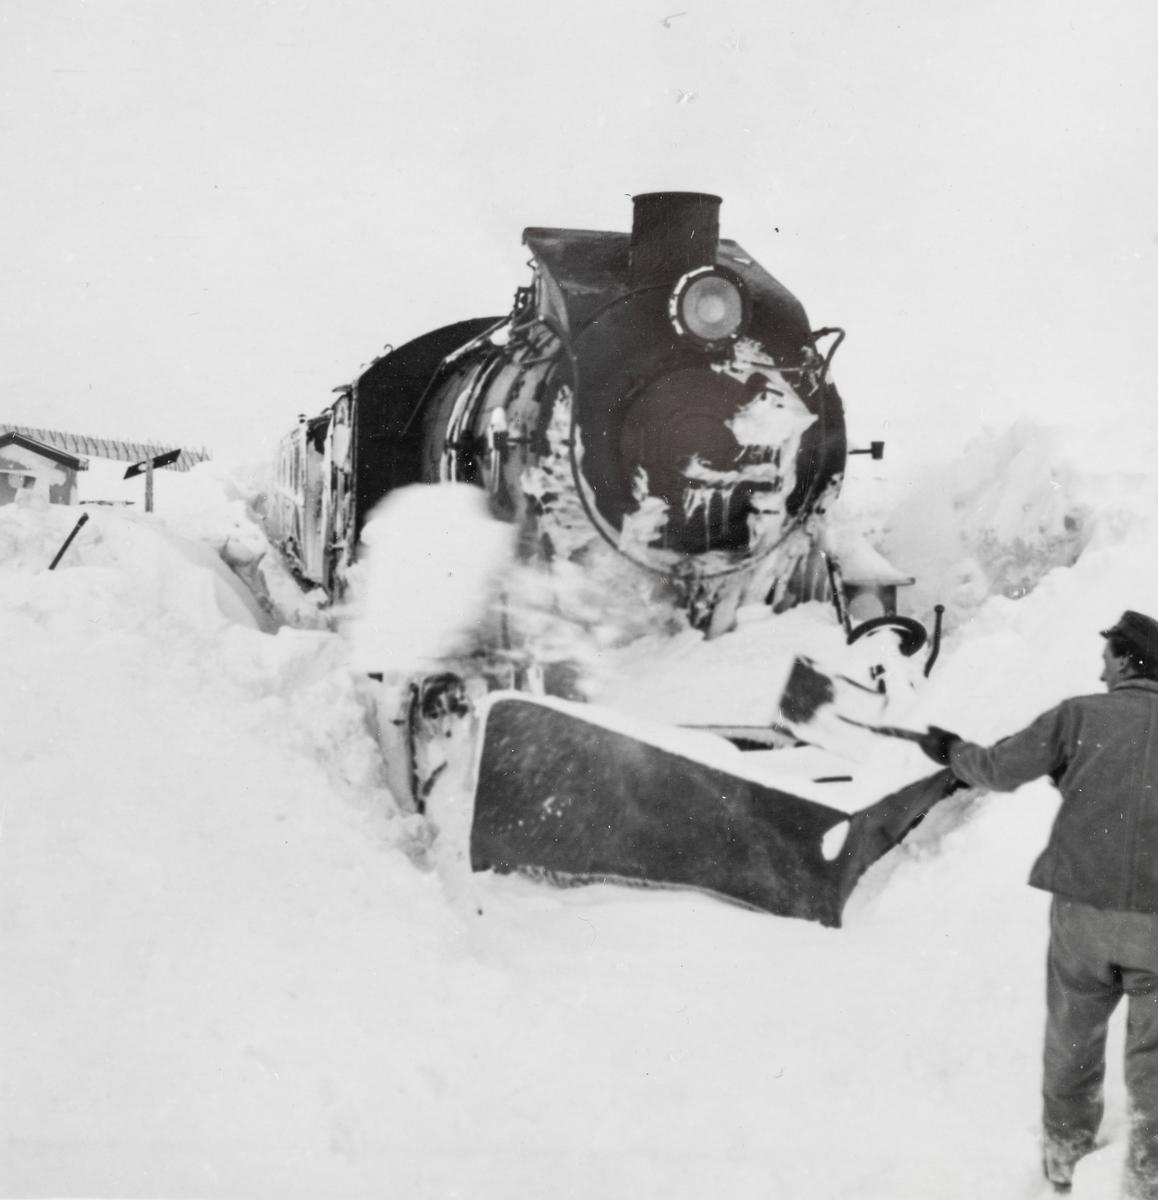 Toget fra Mo i Rana til Lønsdal har kjørt seg fast i snøen på Saltfjellet. Jernbanepersonalet arbeider med å spa løs toget. Damplokomotiv type 33c nr. 396.